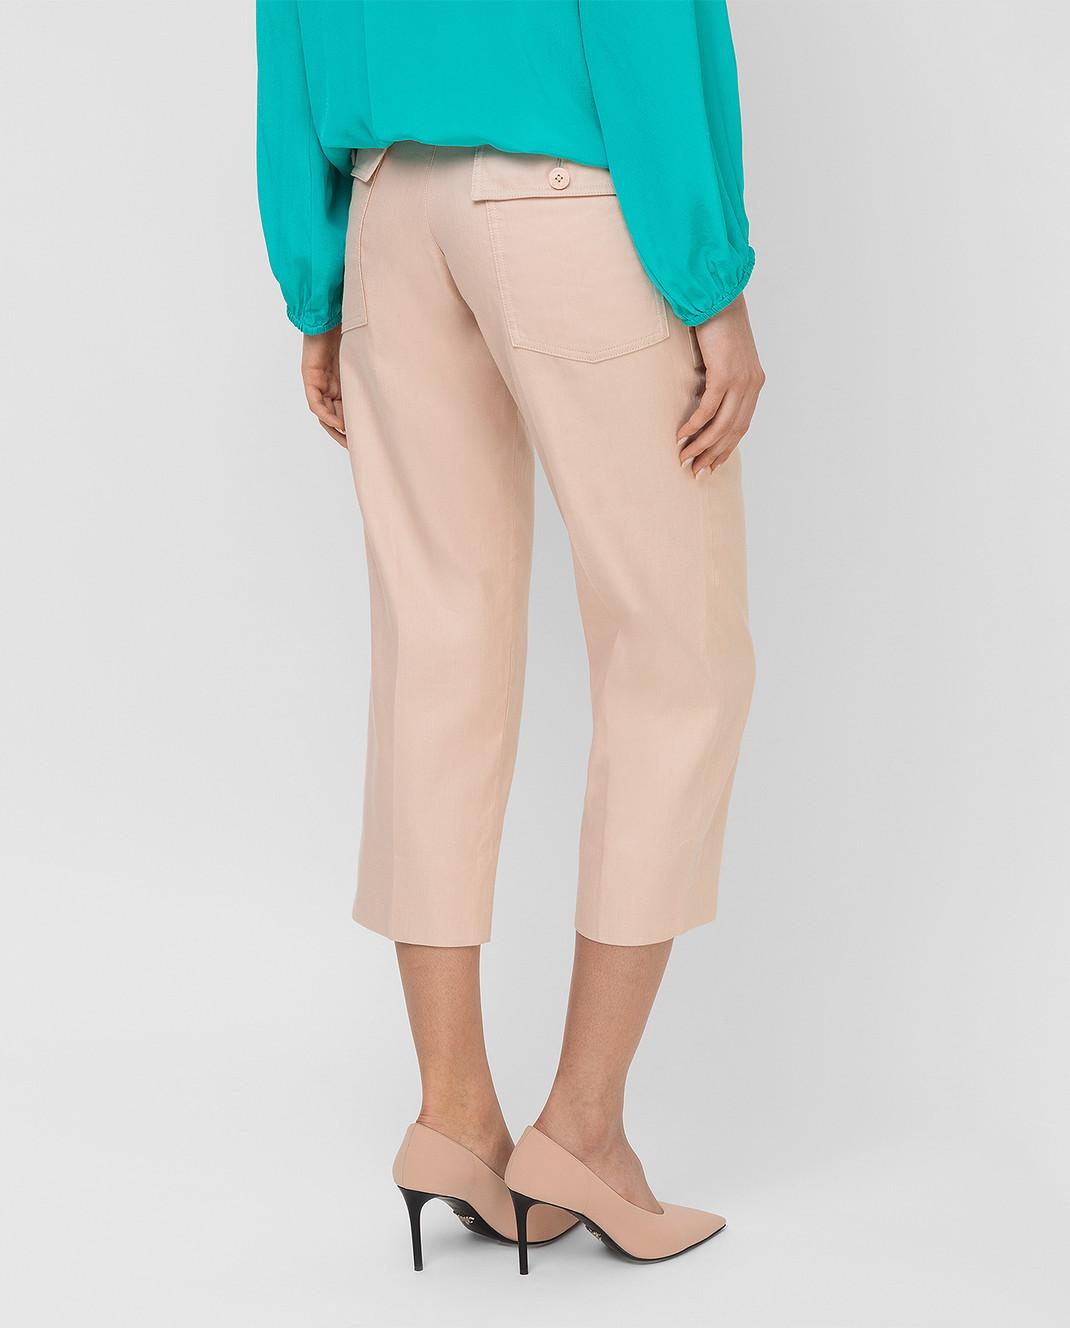 Chloe Светло-бежевые брюки 17EPA58 изображение 4